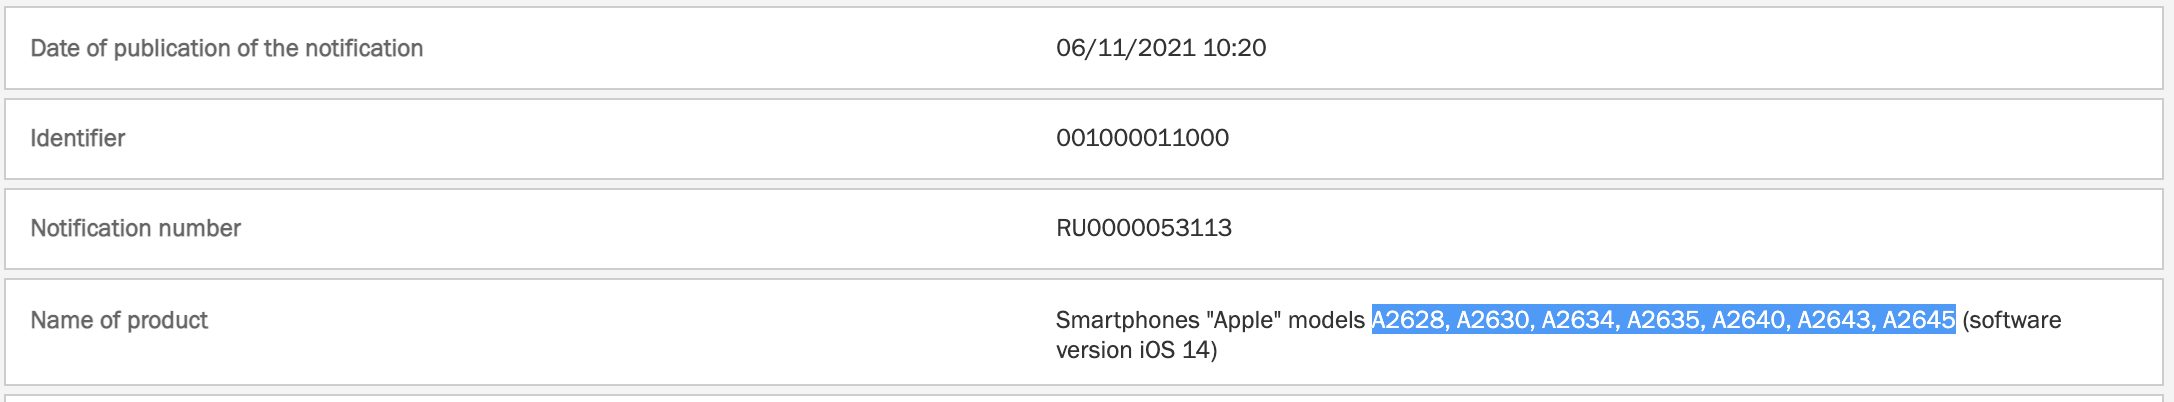 iPhone 13 confirmat europa